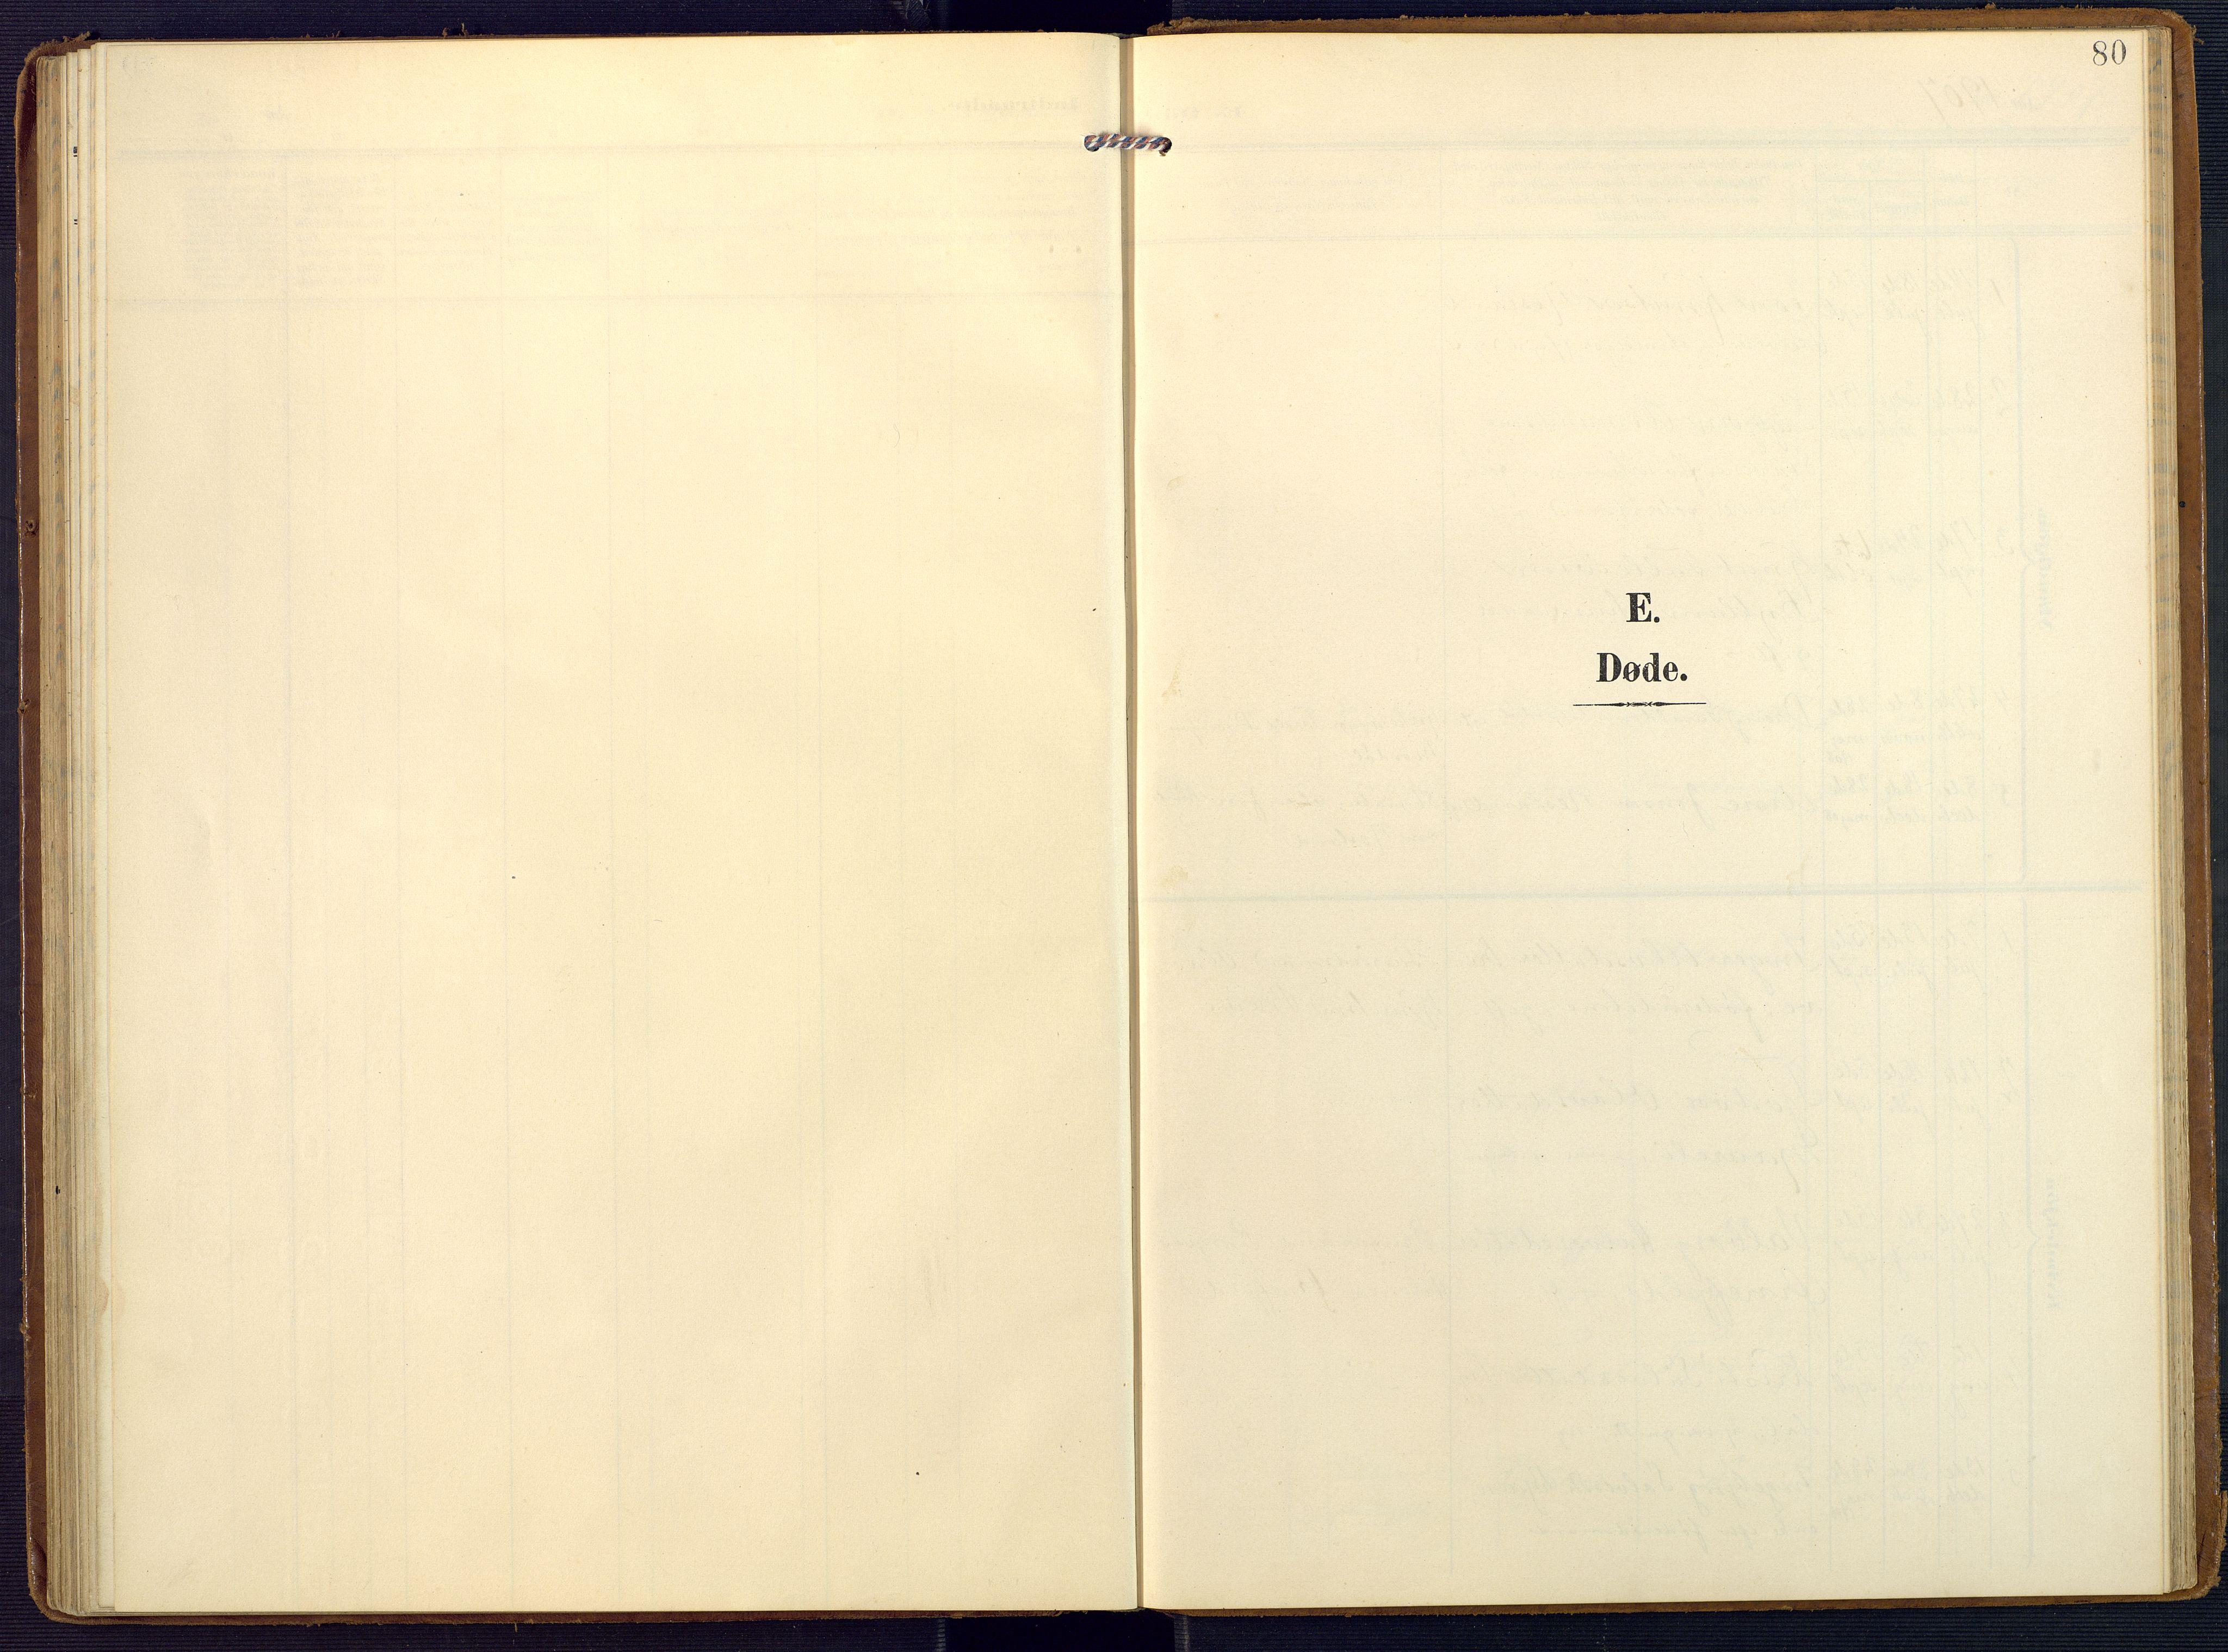 SAK, Valle sokneprestkontor, F/Fa/Faa/L0002: Ministerialbok nr. A 2, 1907-1919, s. 80